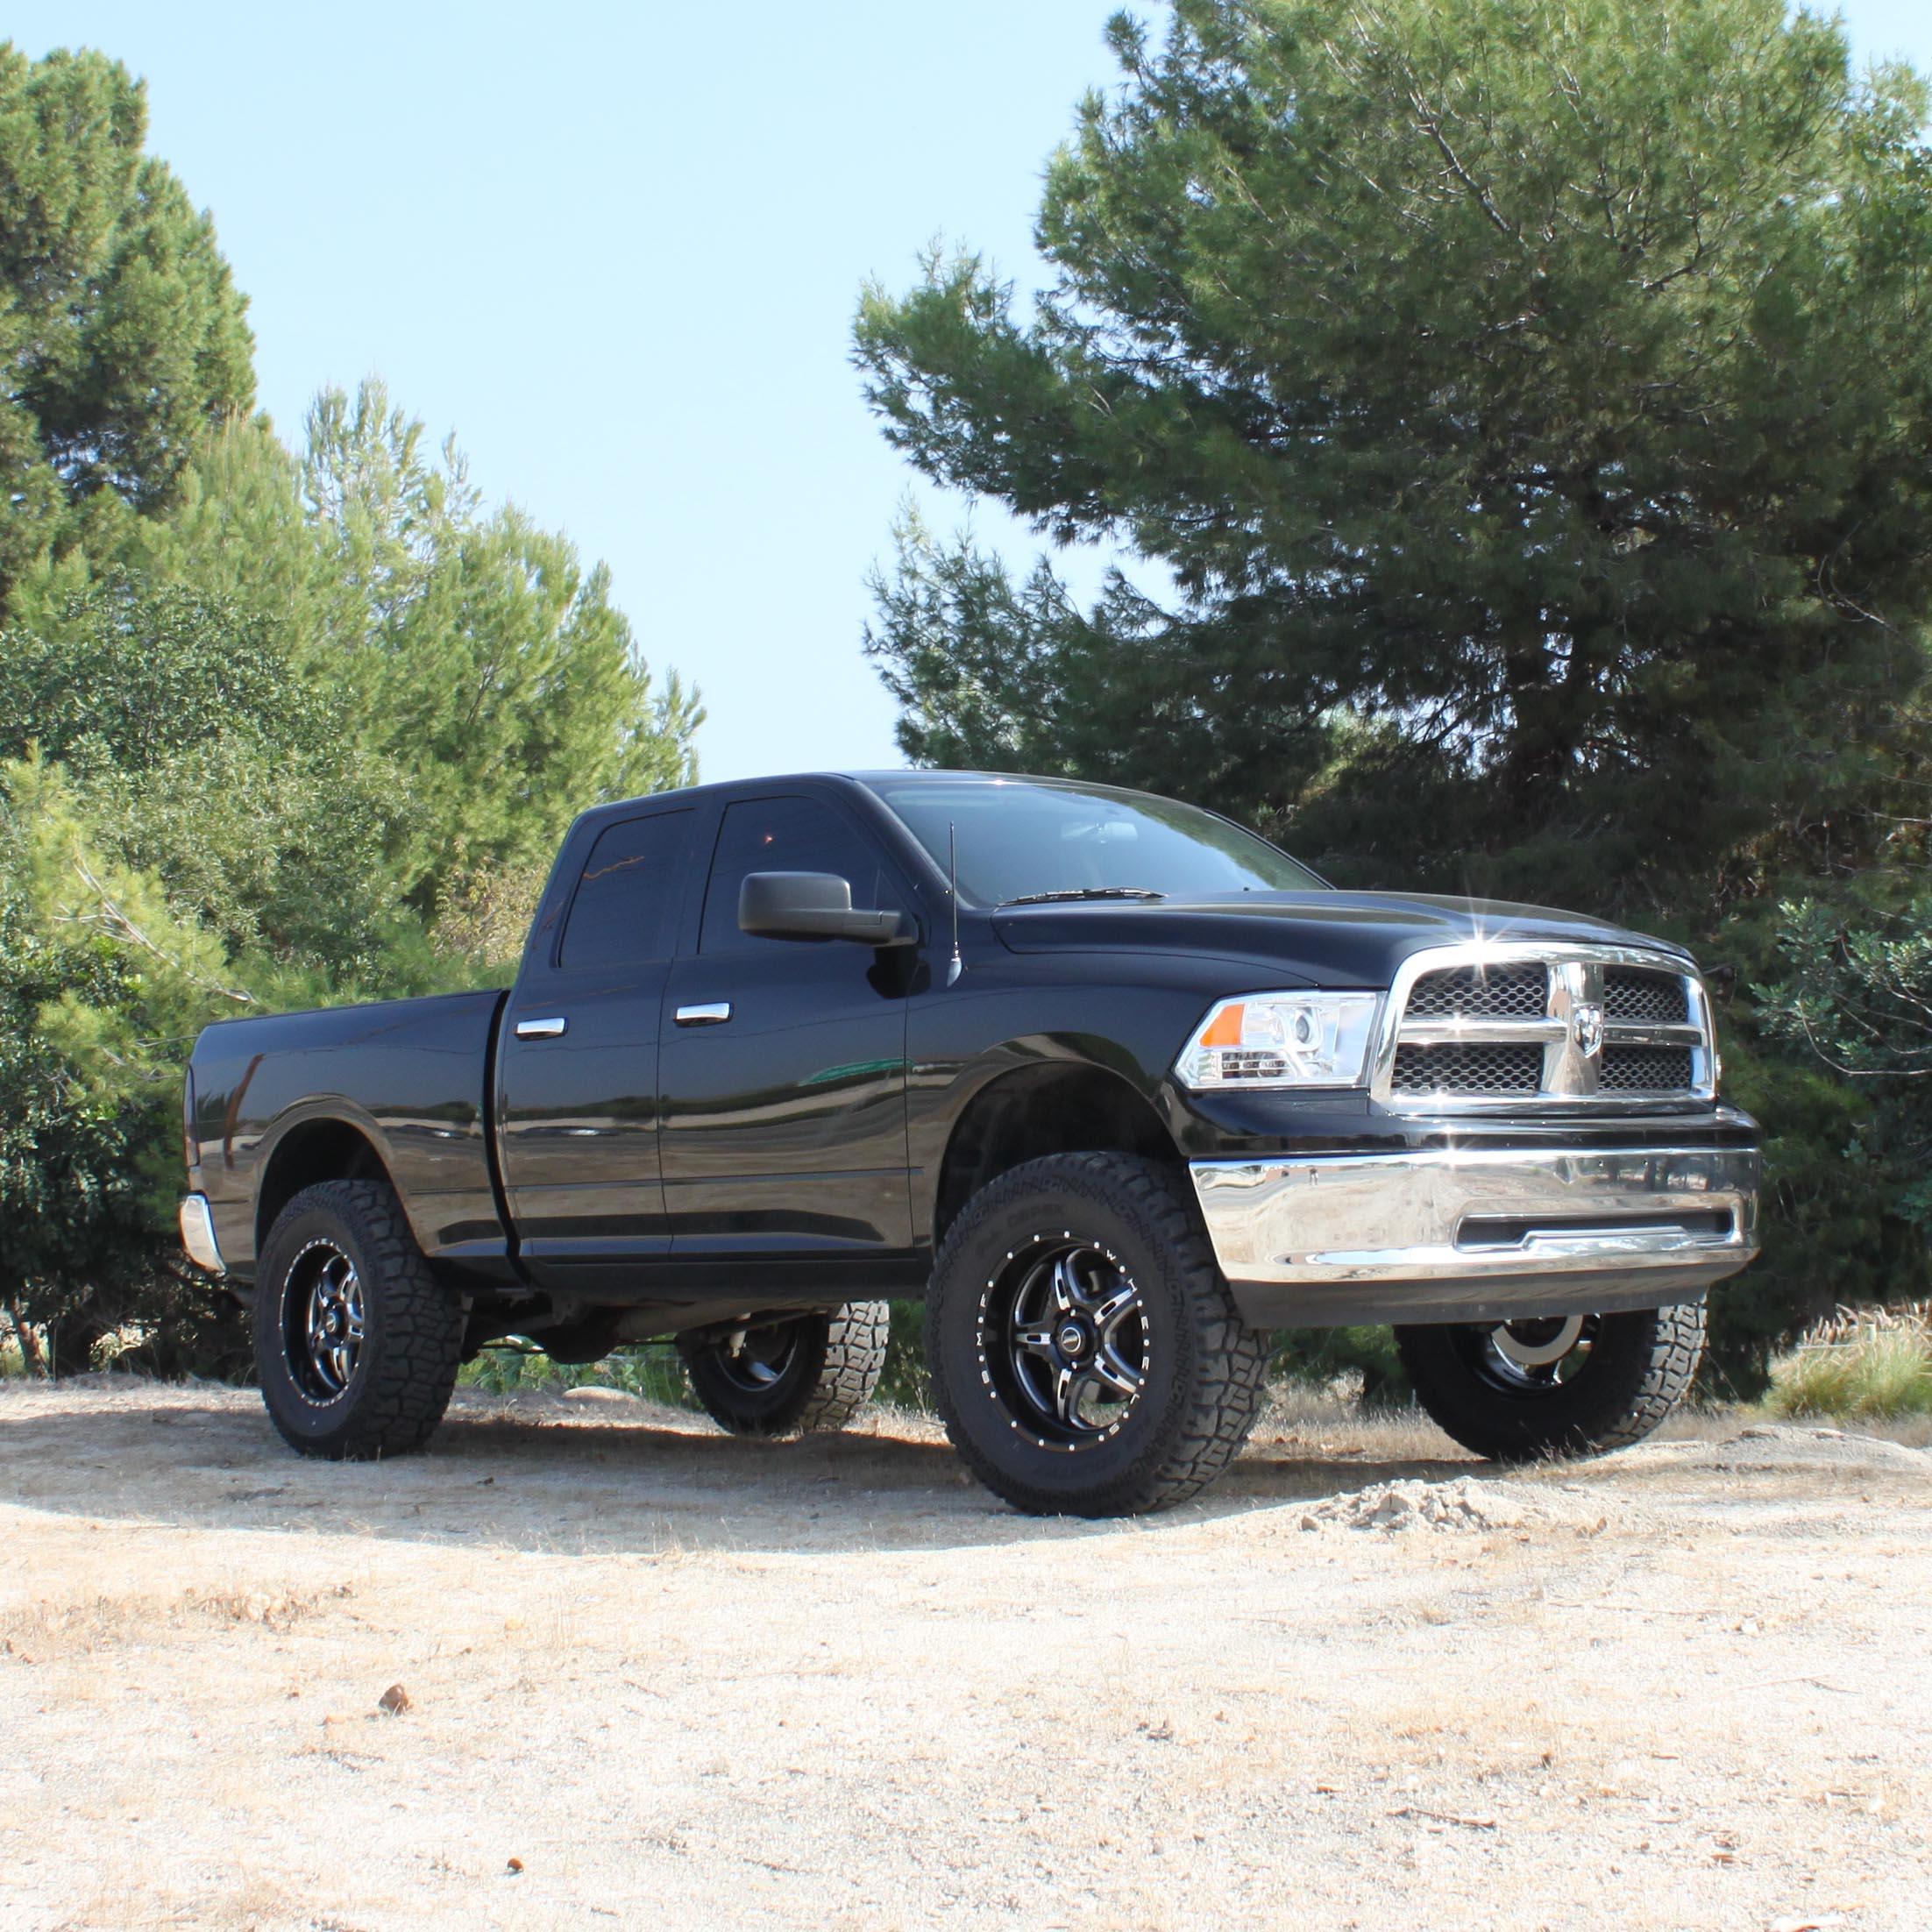 Lift Kits For Dodge Trucks: MaxTrac Releases Ram 1500 4.5-Inch, 7-Inch Lift Kits